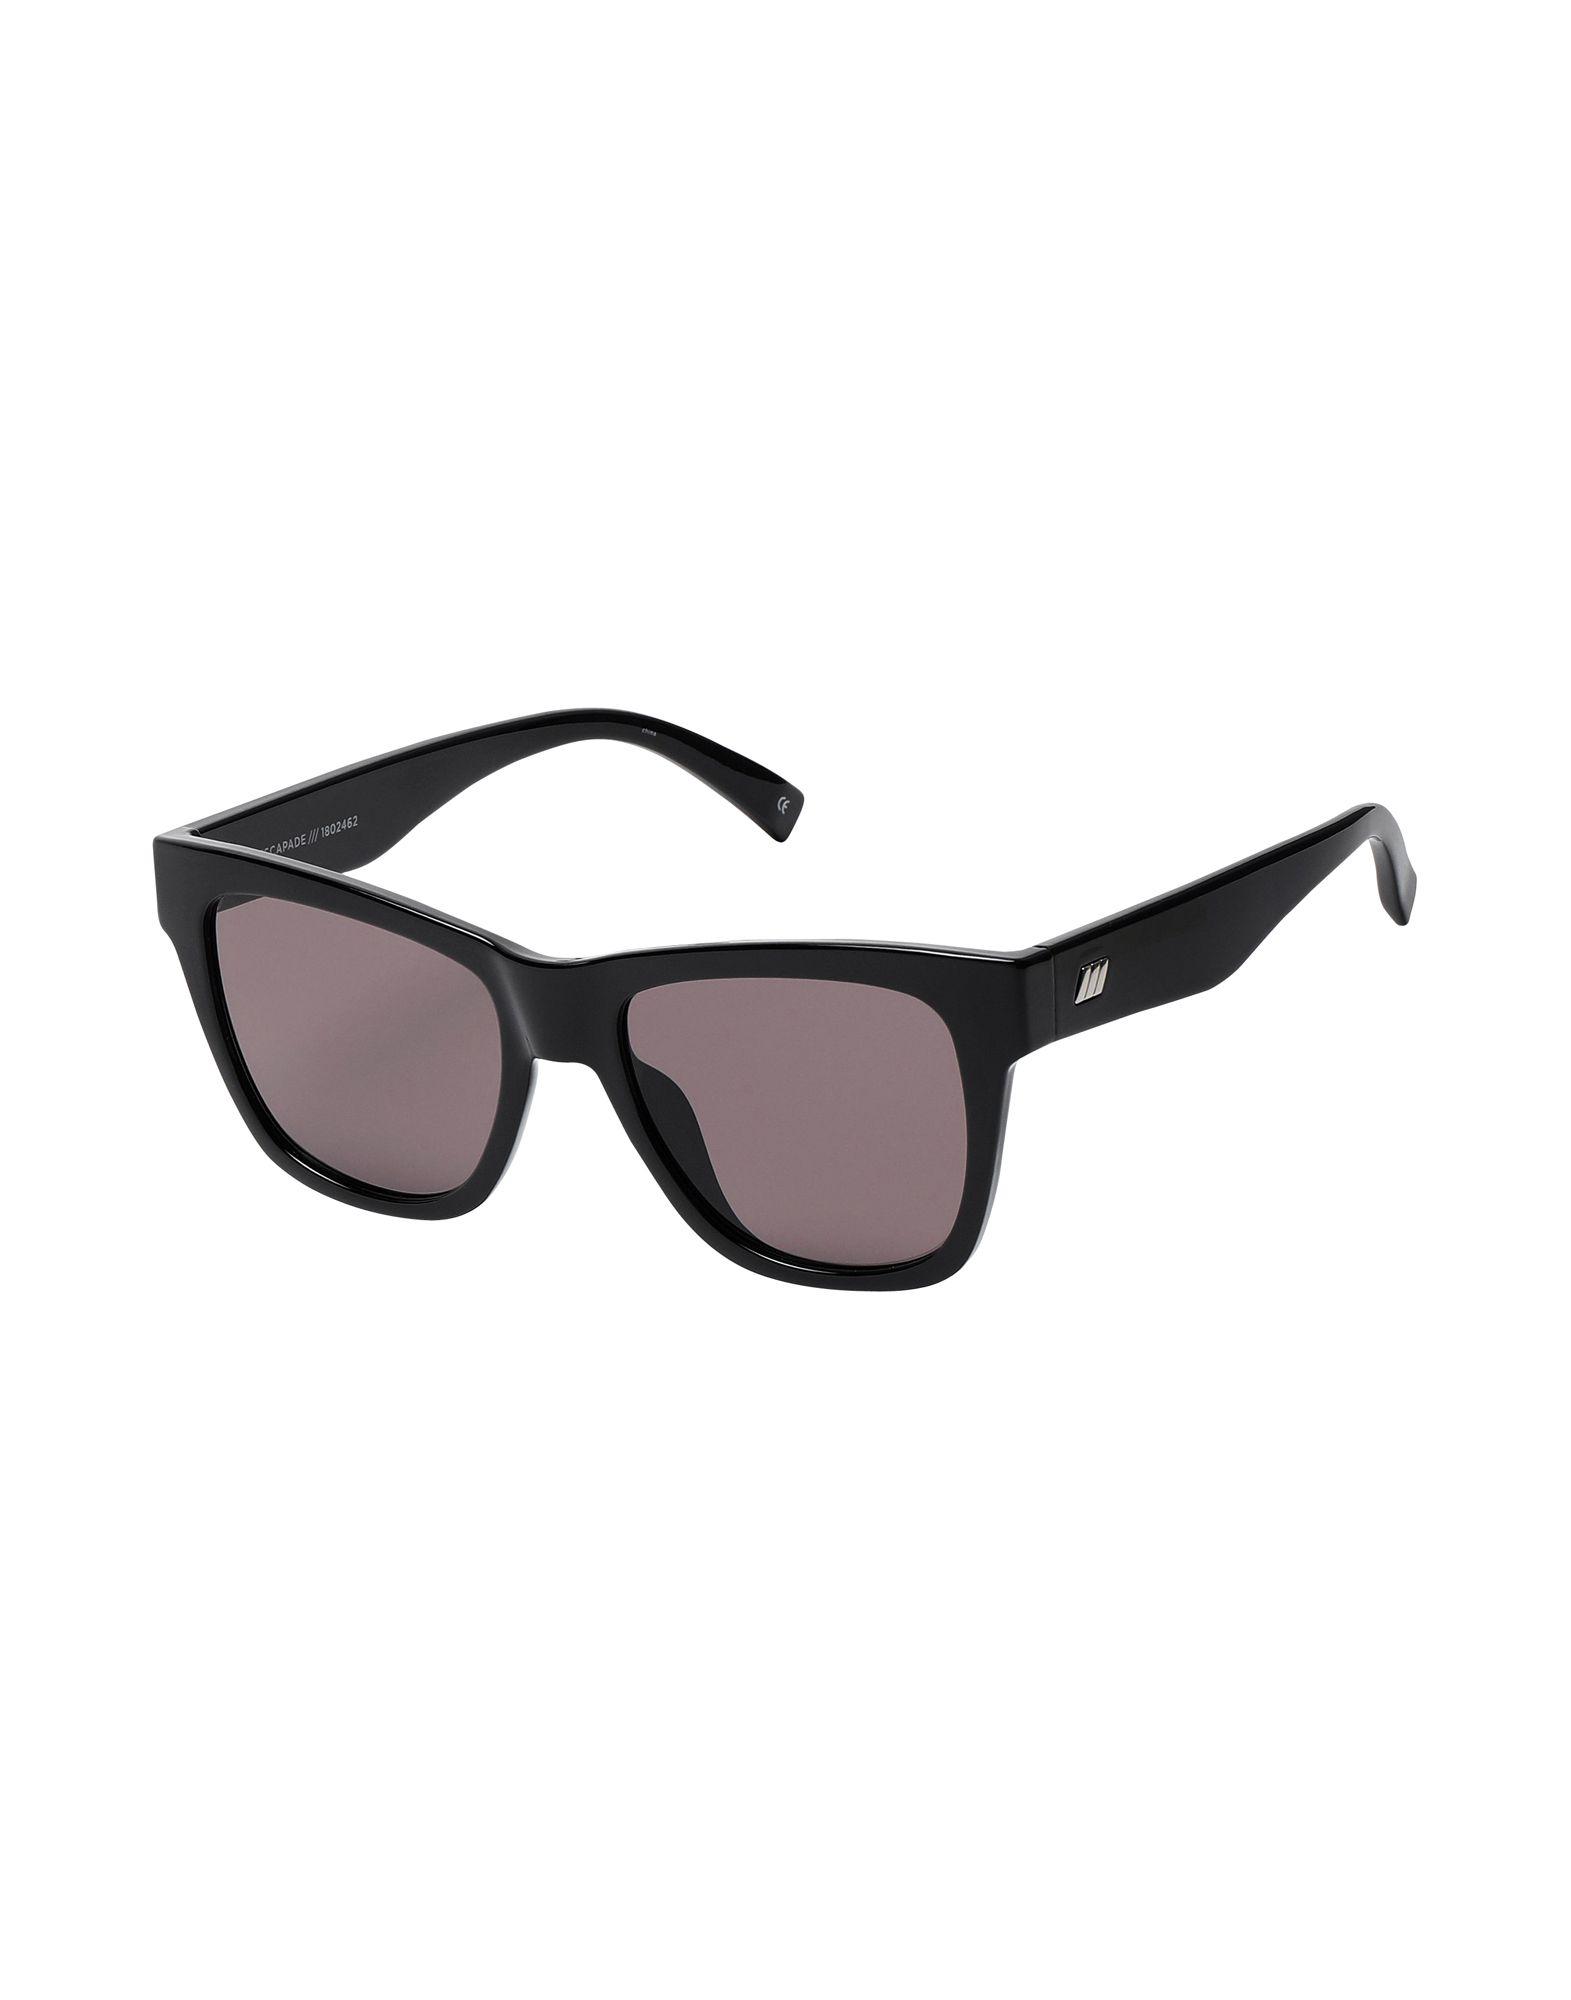 Фото - LE SPECS Солнечные очки le specs солнечные очки